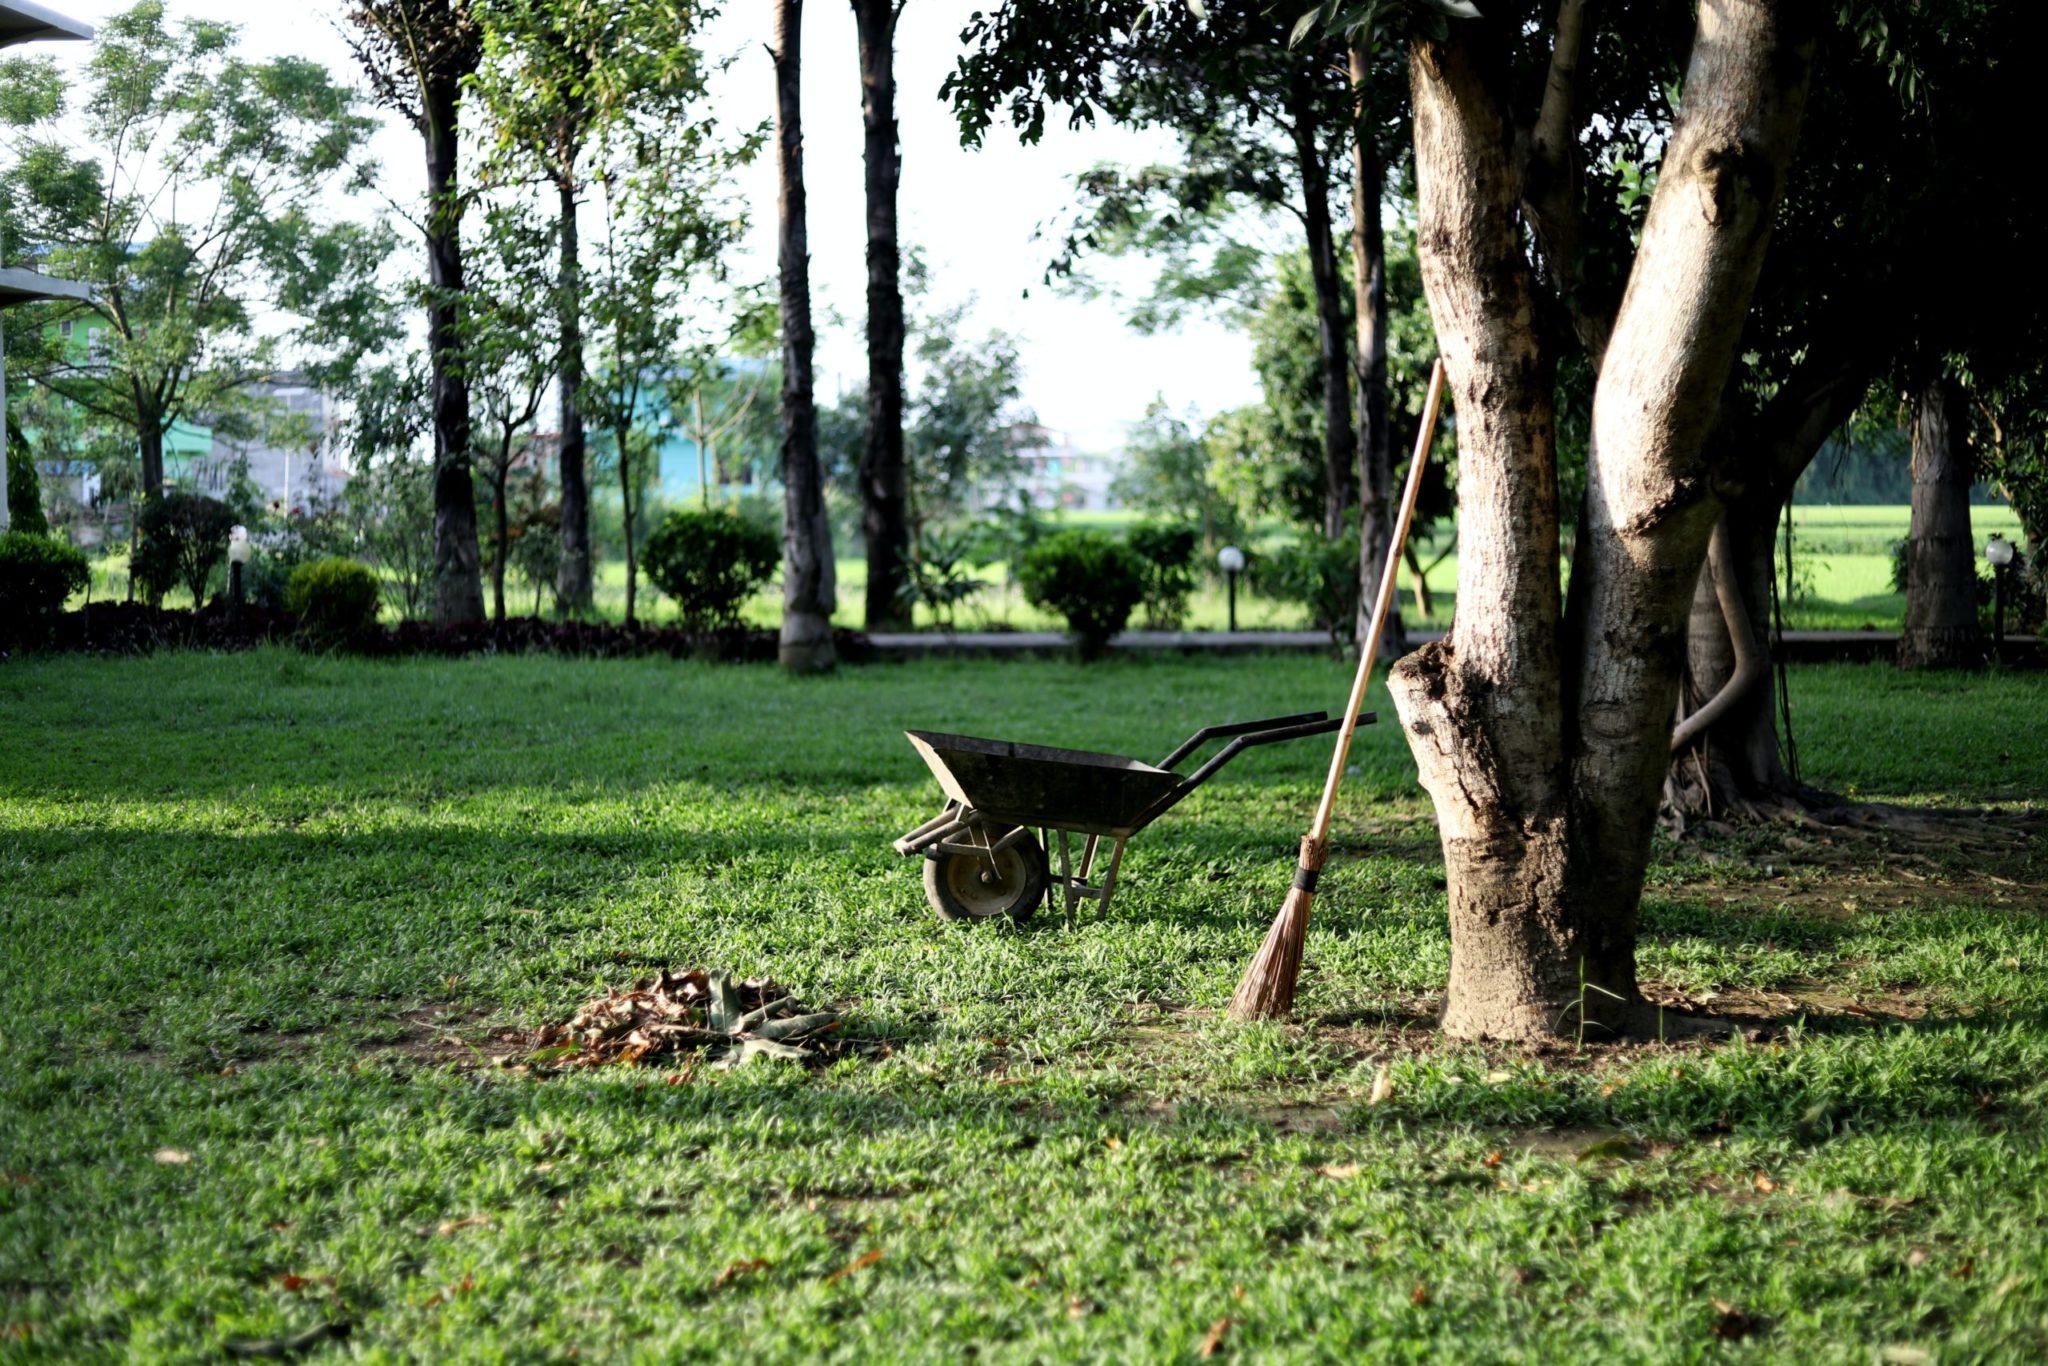 black wheelbarrow near tree during daytime